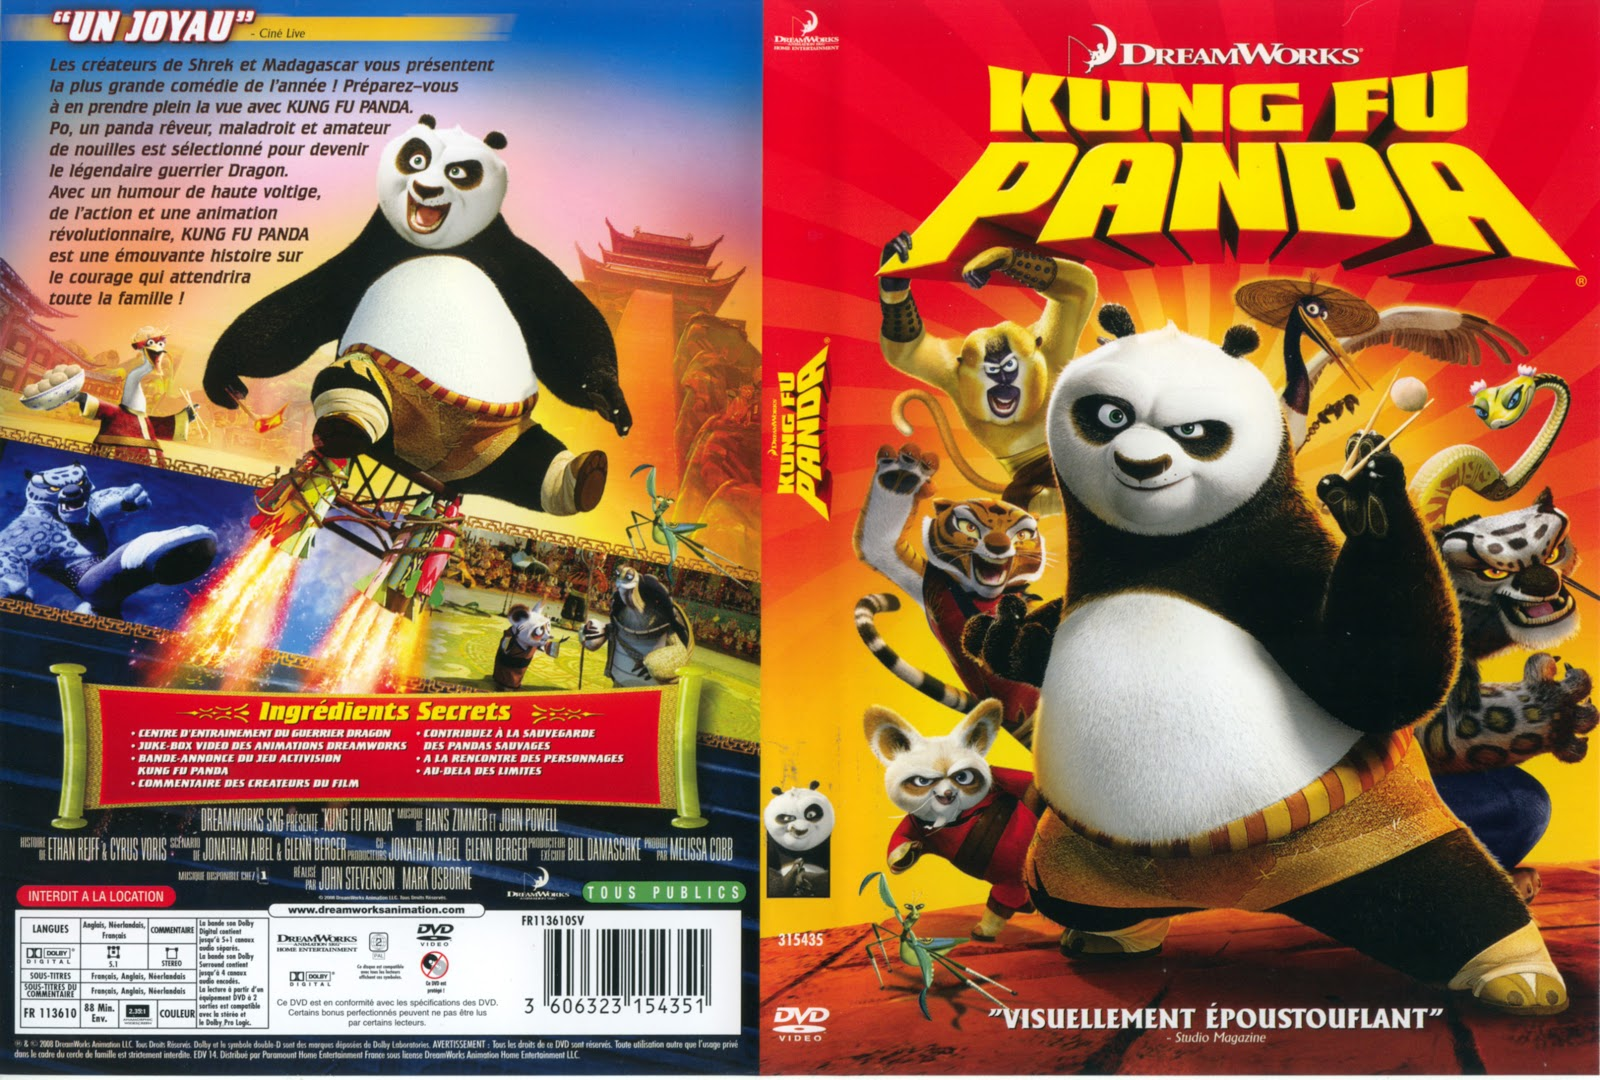 JAQUETTE DVD: Jaquette Dvd Kung Fu Panda